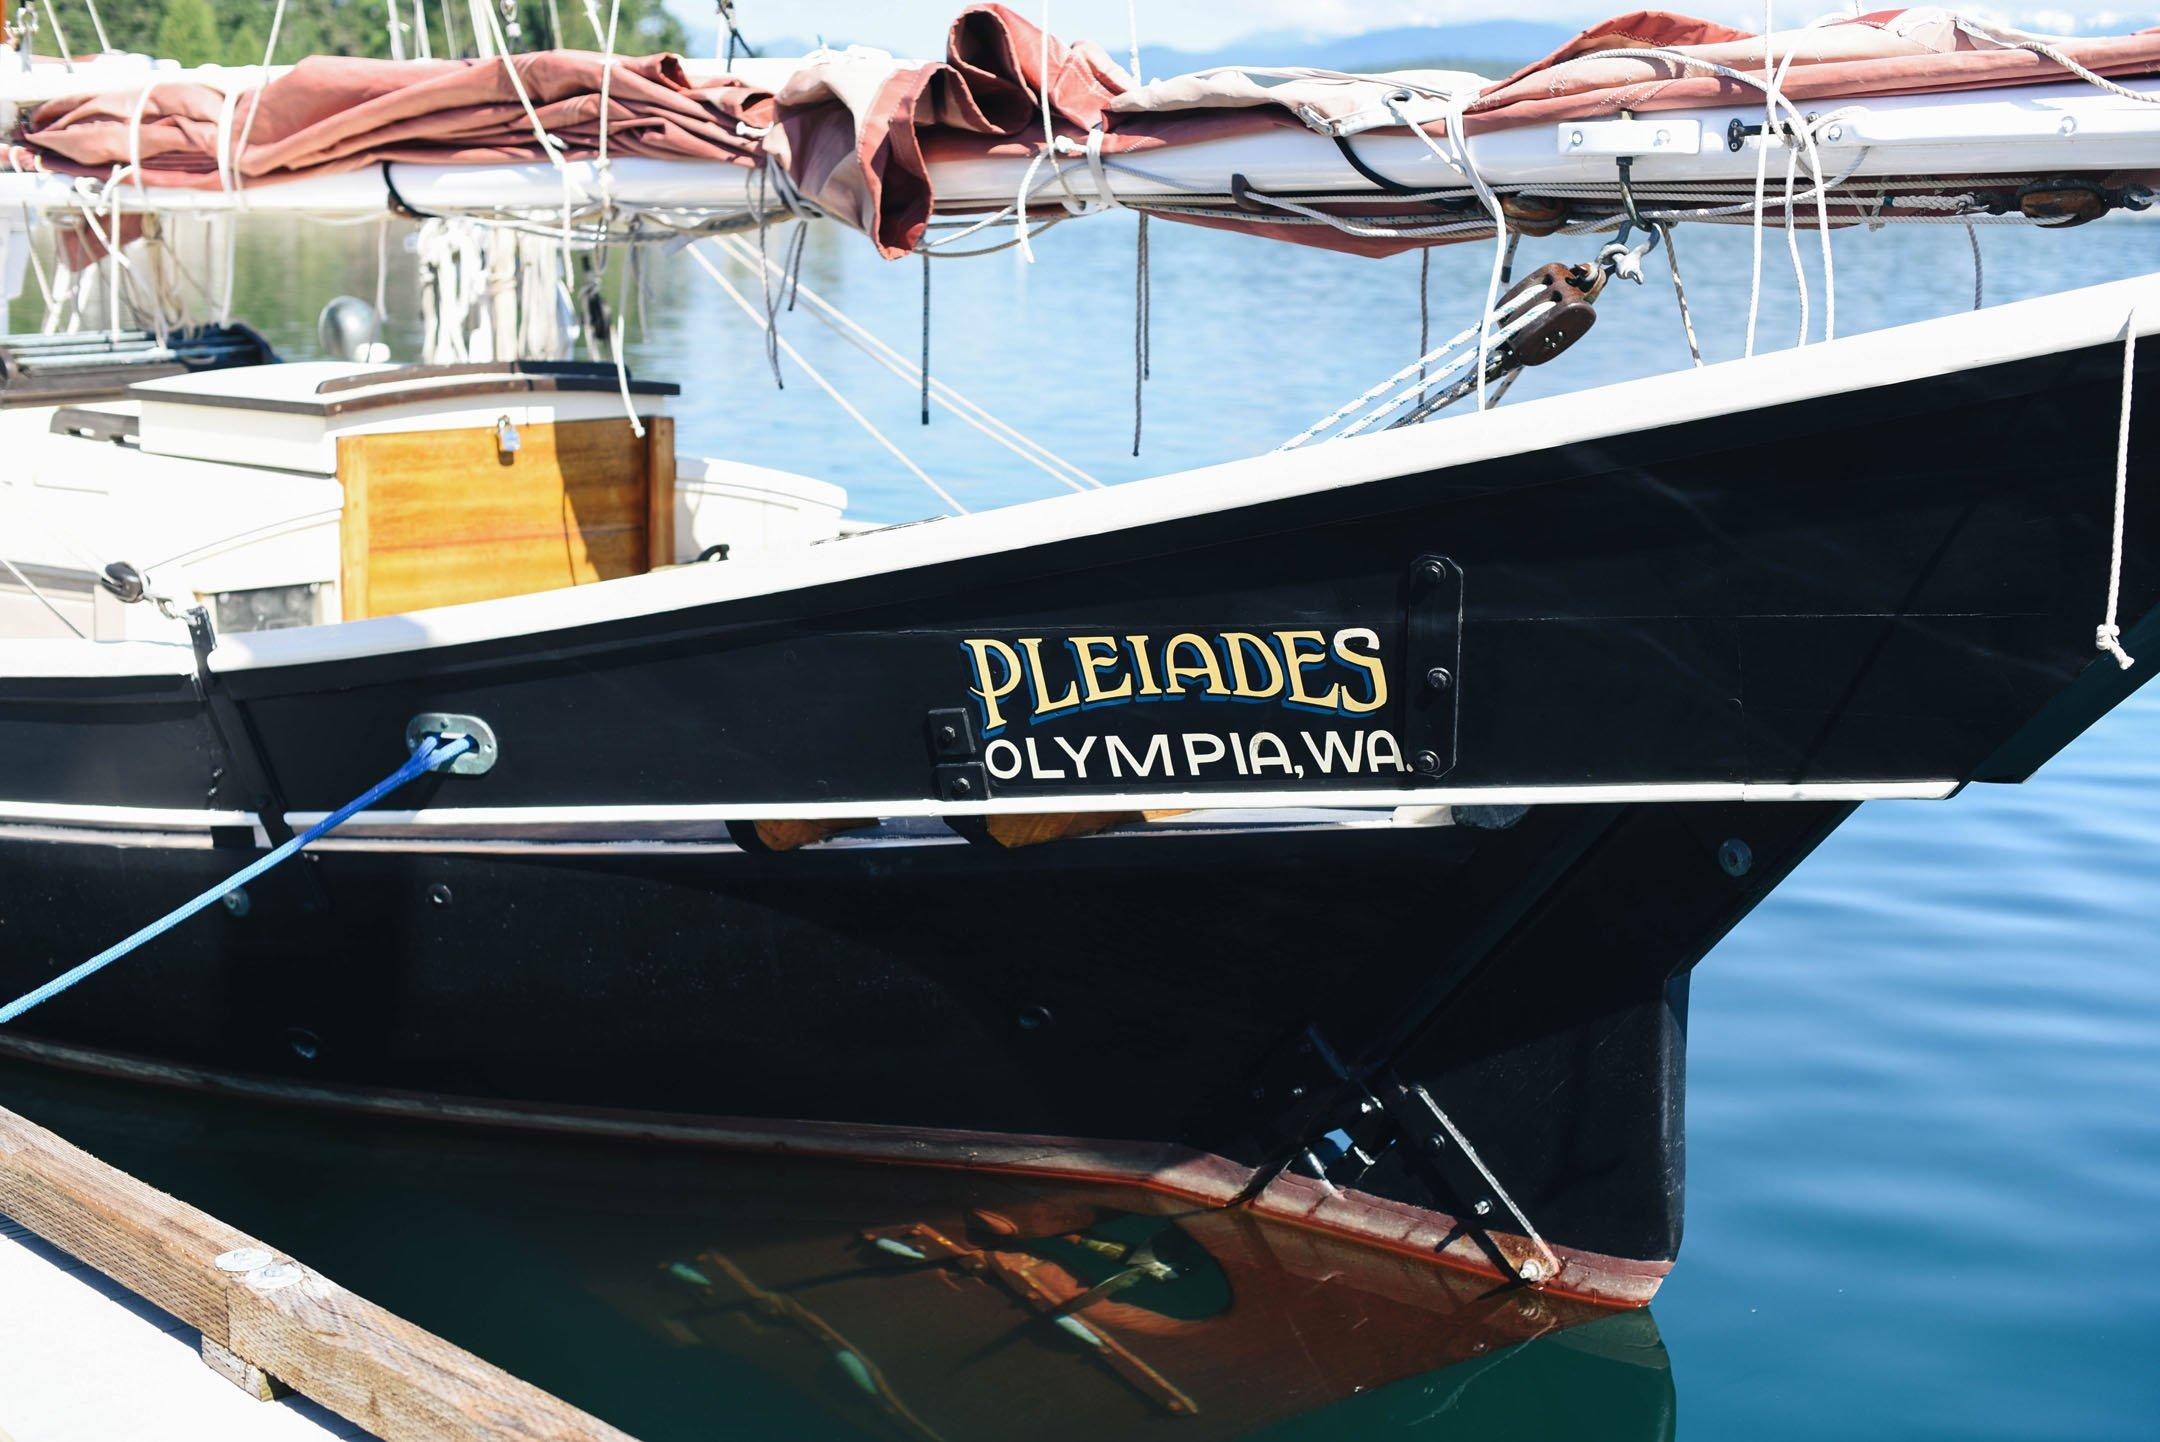 Pleiades olympia washington boat